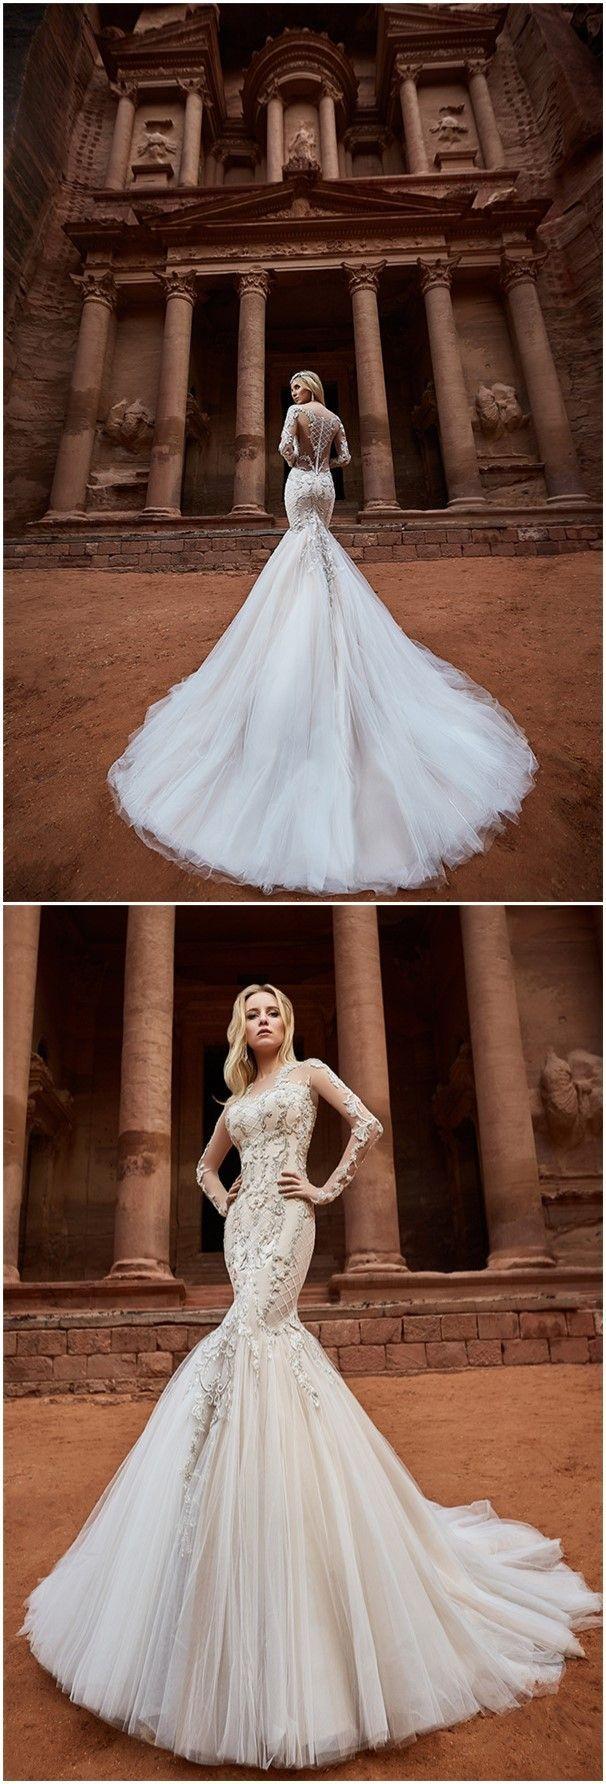 Latest oksana mukha wedding dresses collection lace wedding